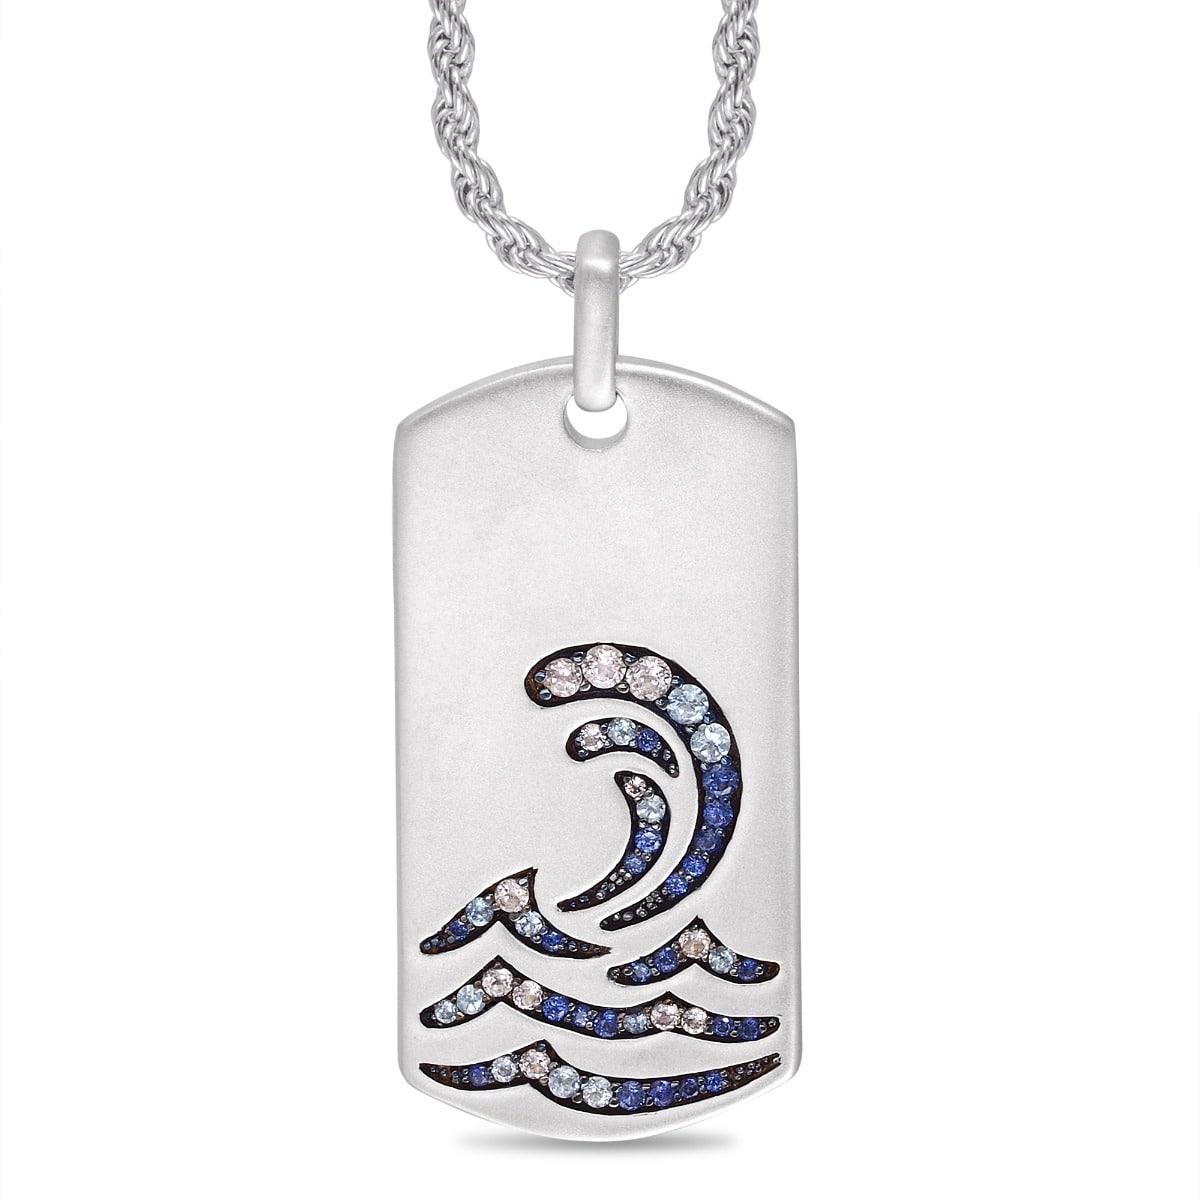 Rhodium Plated Sterling Silver Surfrider Beach White Topaz & Blue Sapphire Stone Tag